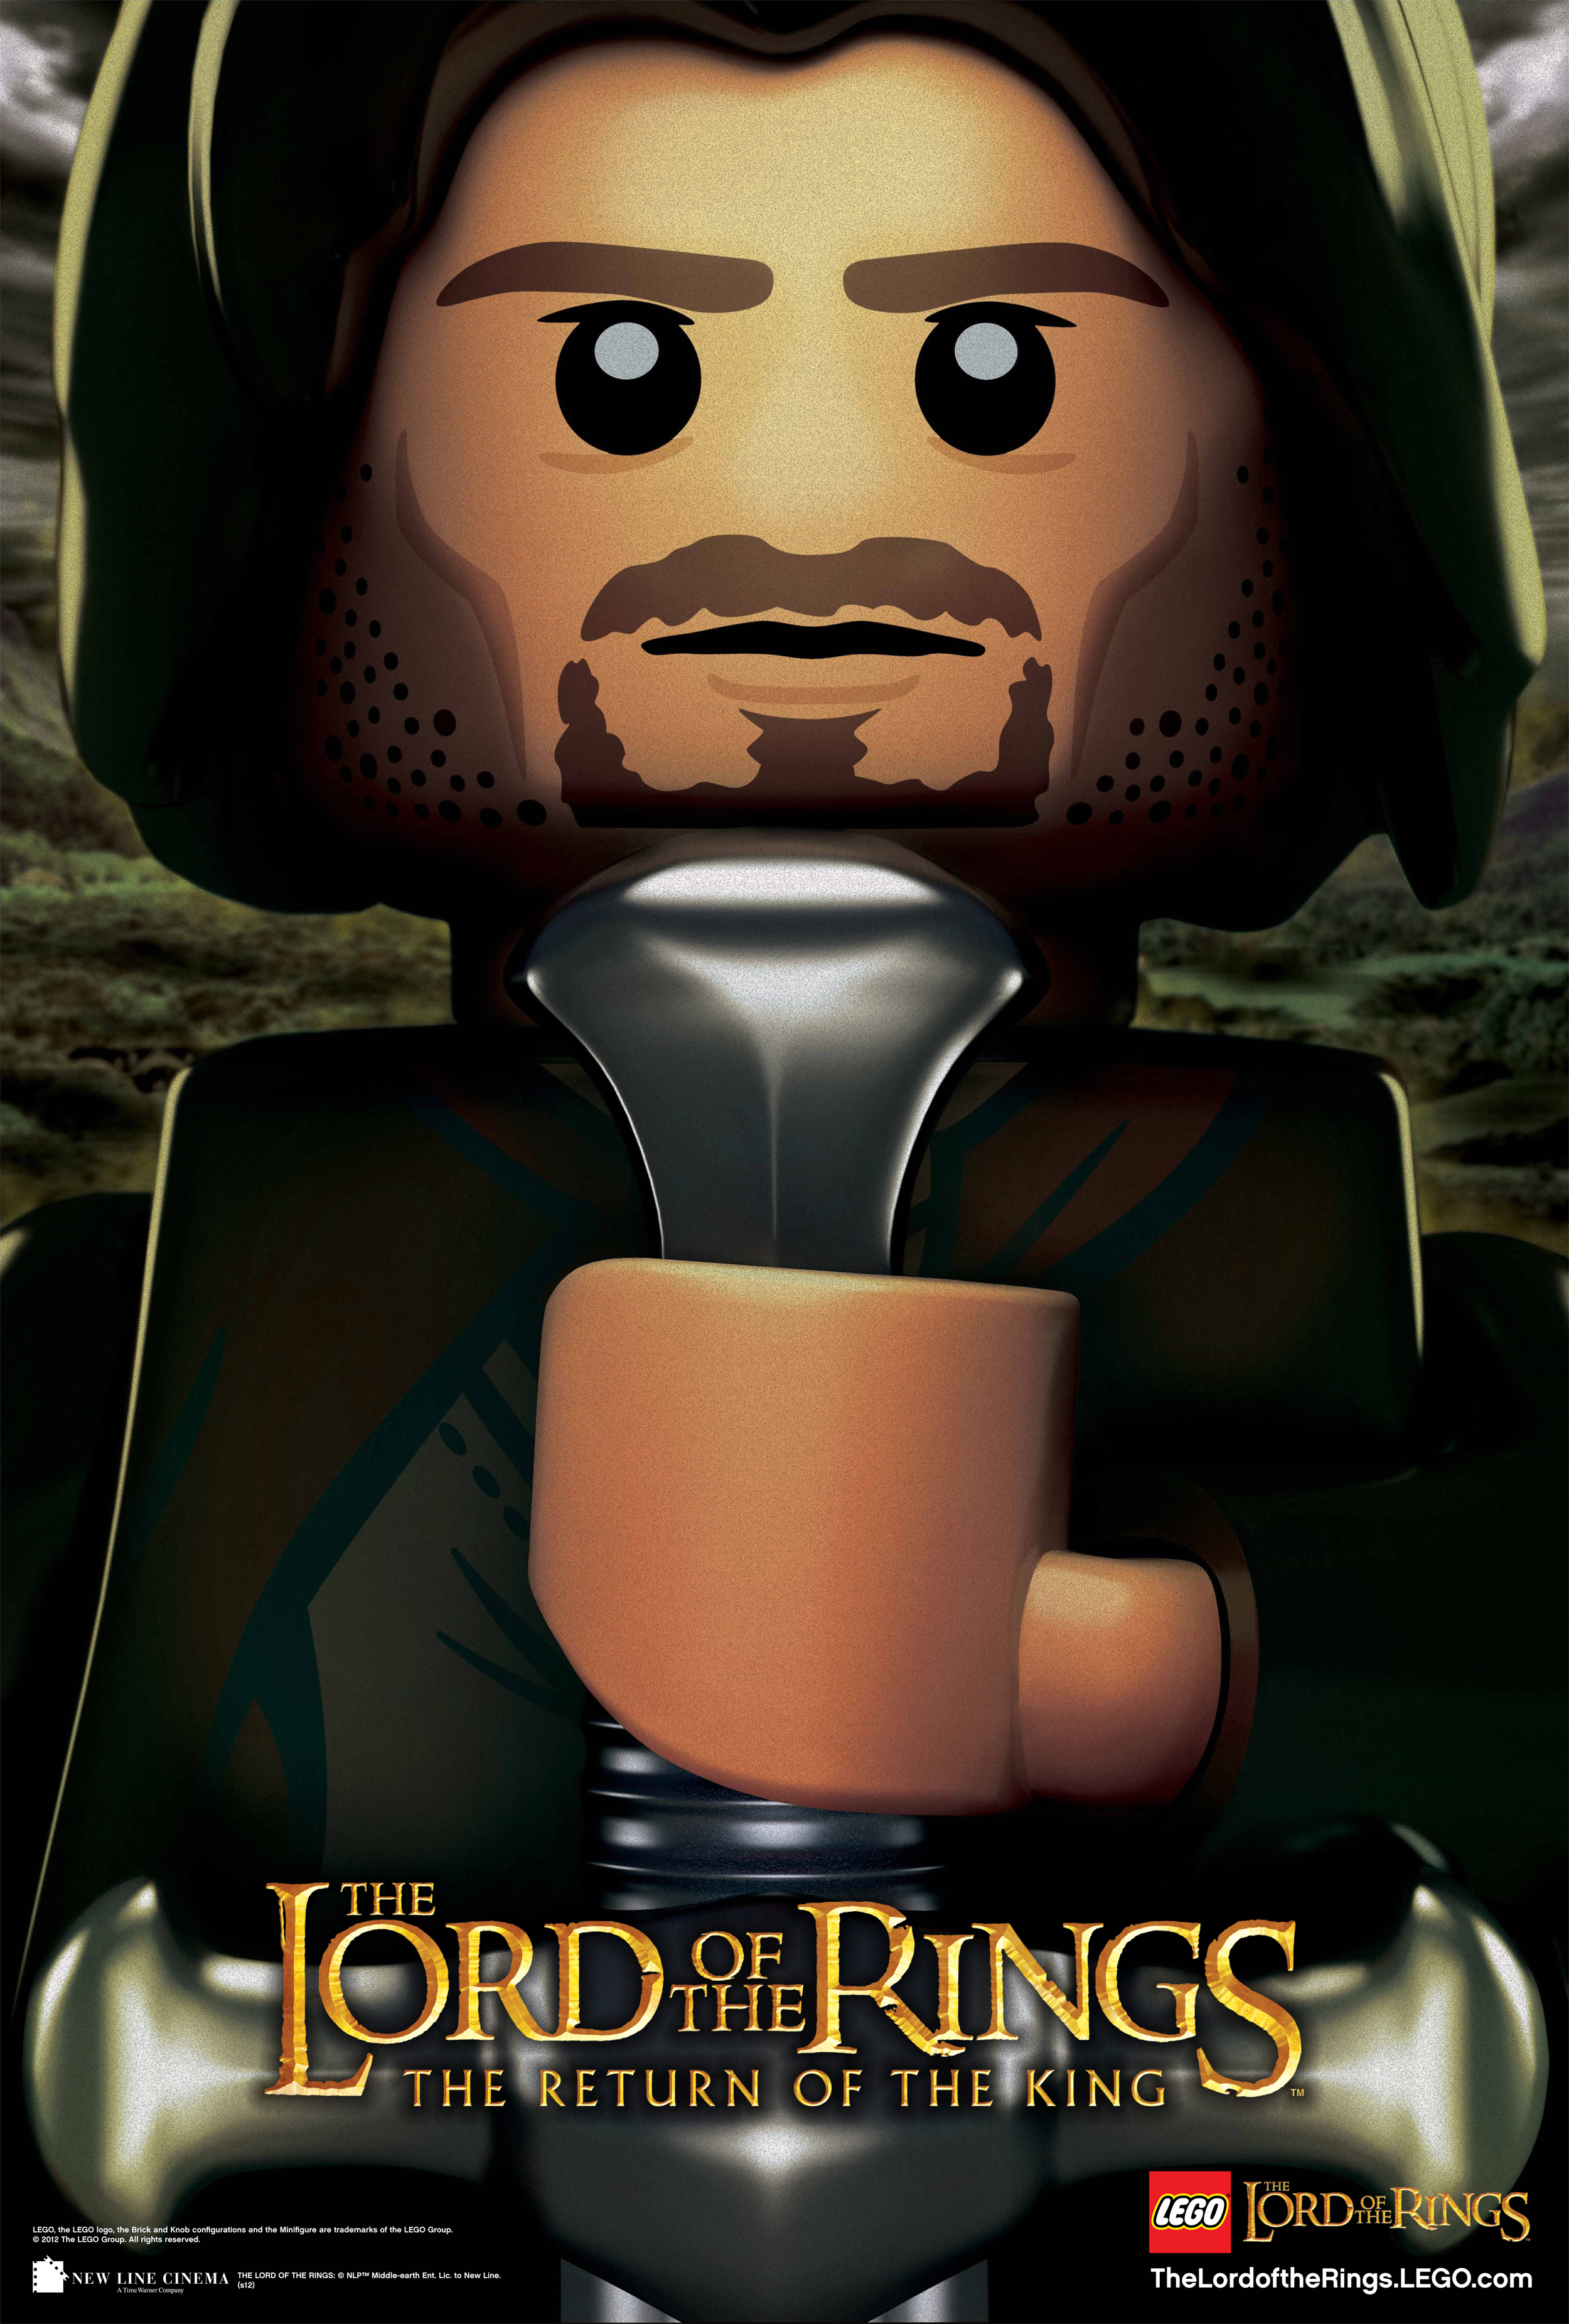 Aragorn Lego collection poster